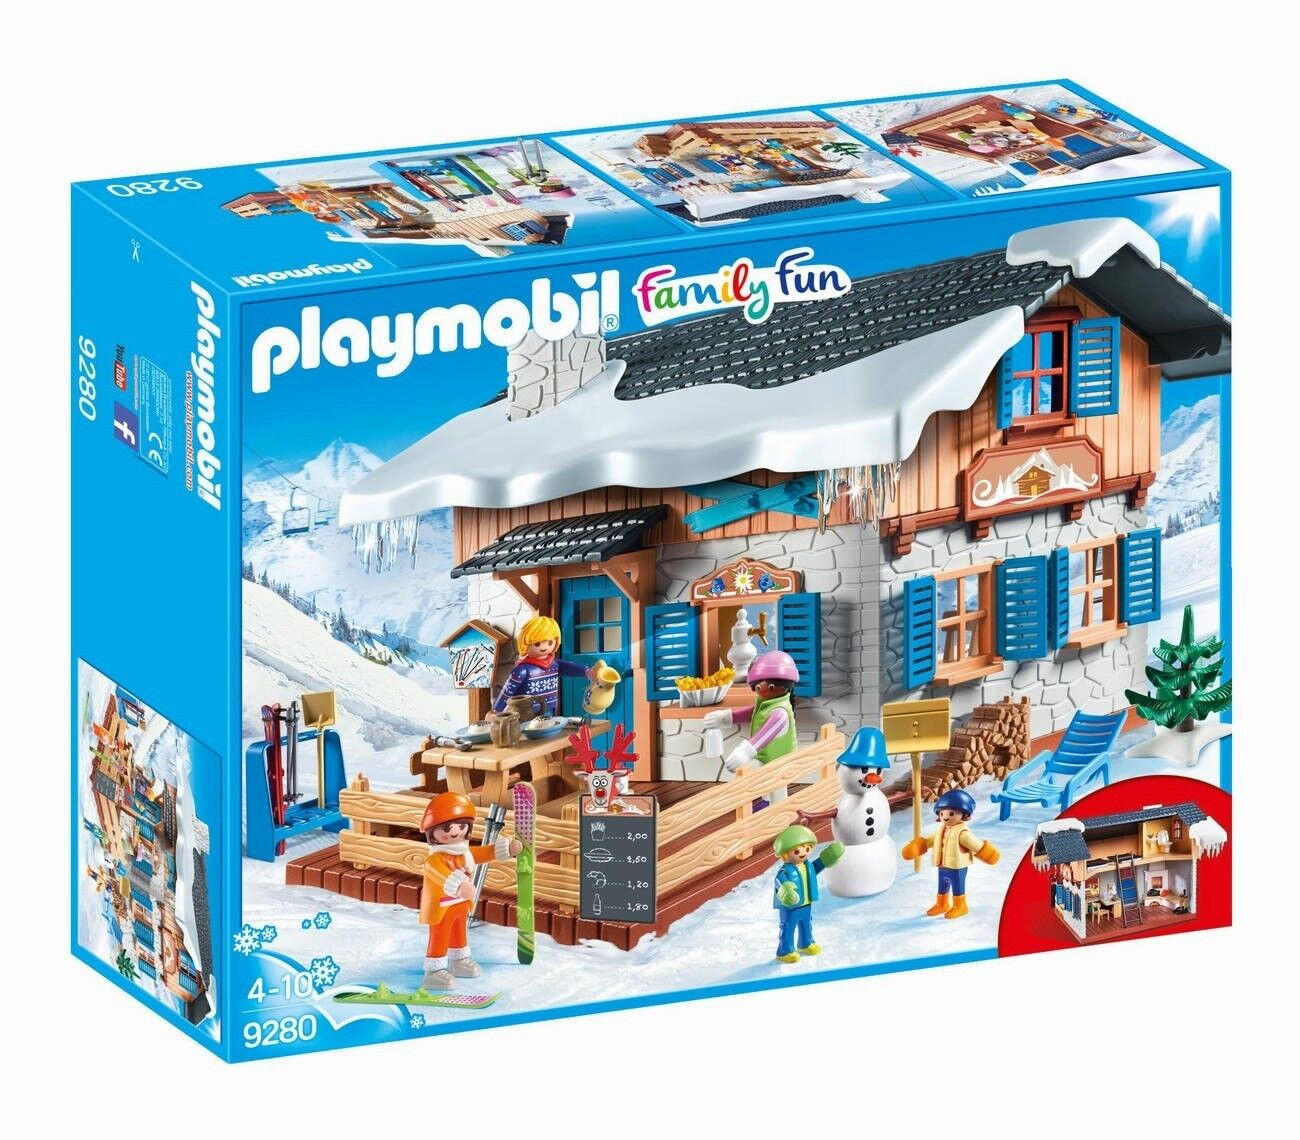 PLAYMOBIL® Family Fun Fun Fun - SKIHÜTTE / WINTER SKI LODGE - Playmobil 9280 - NEU b5f00f